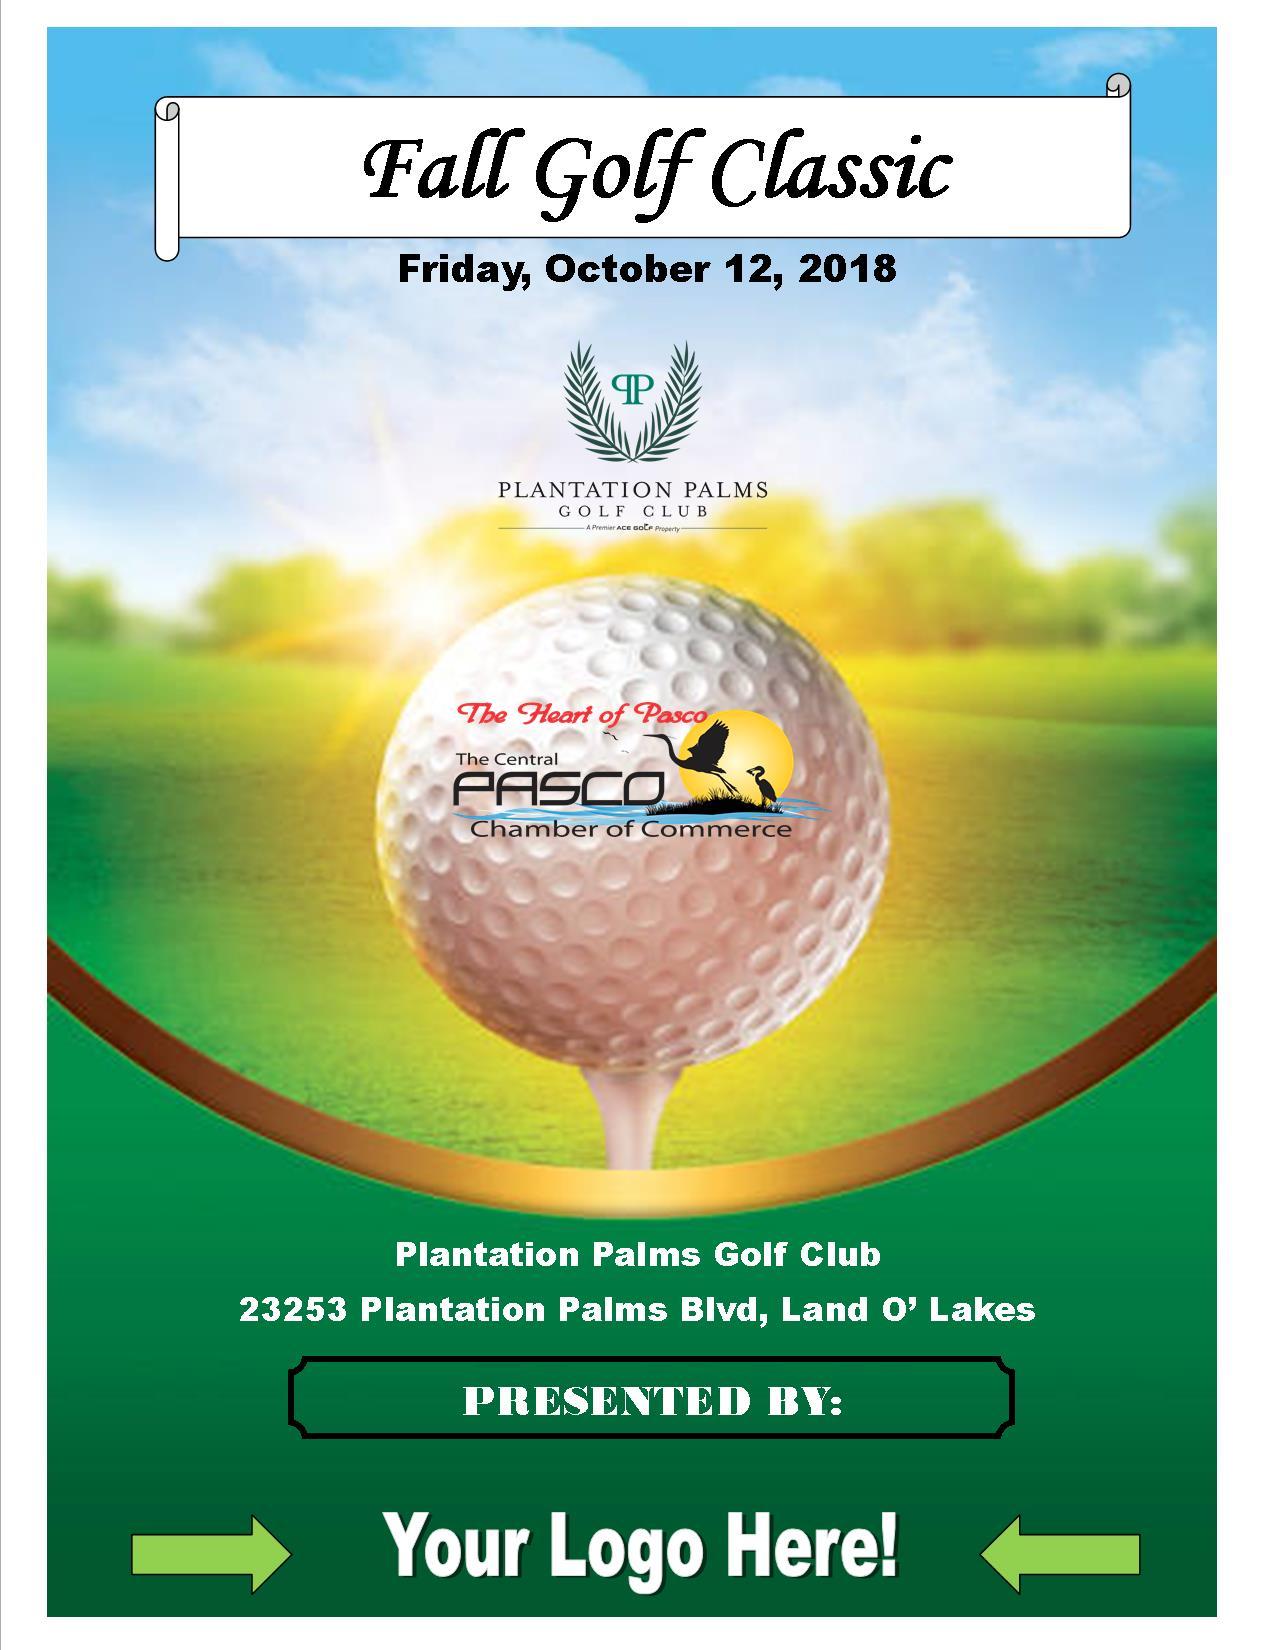 Fall-Golf-Classic-2018-flyer.jpg